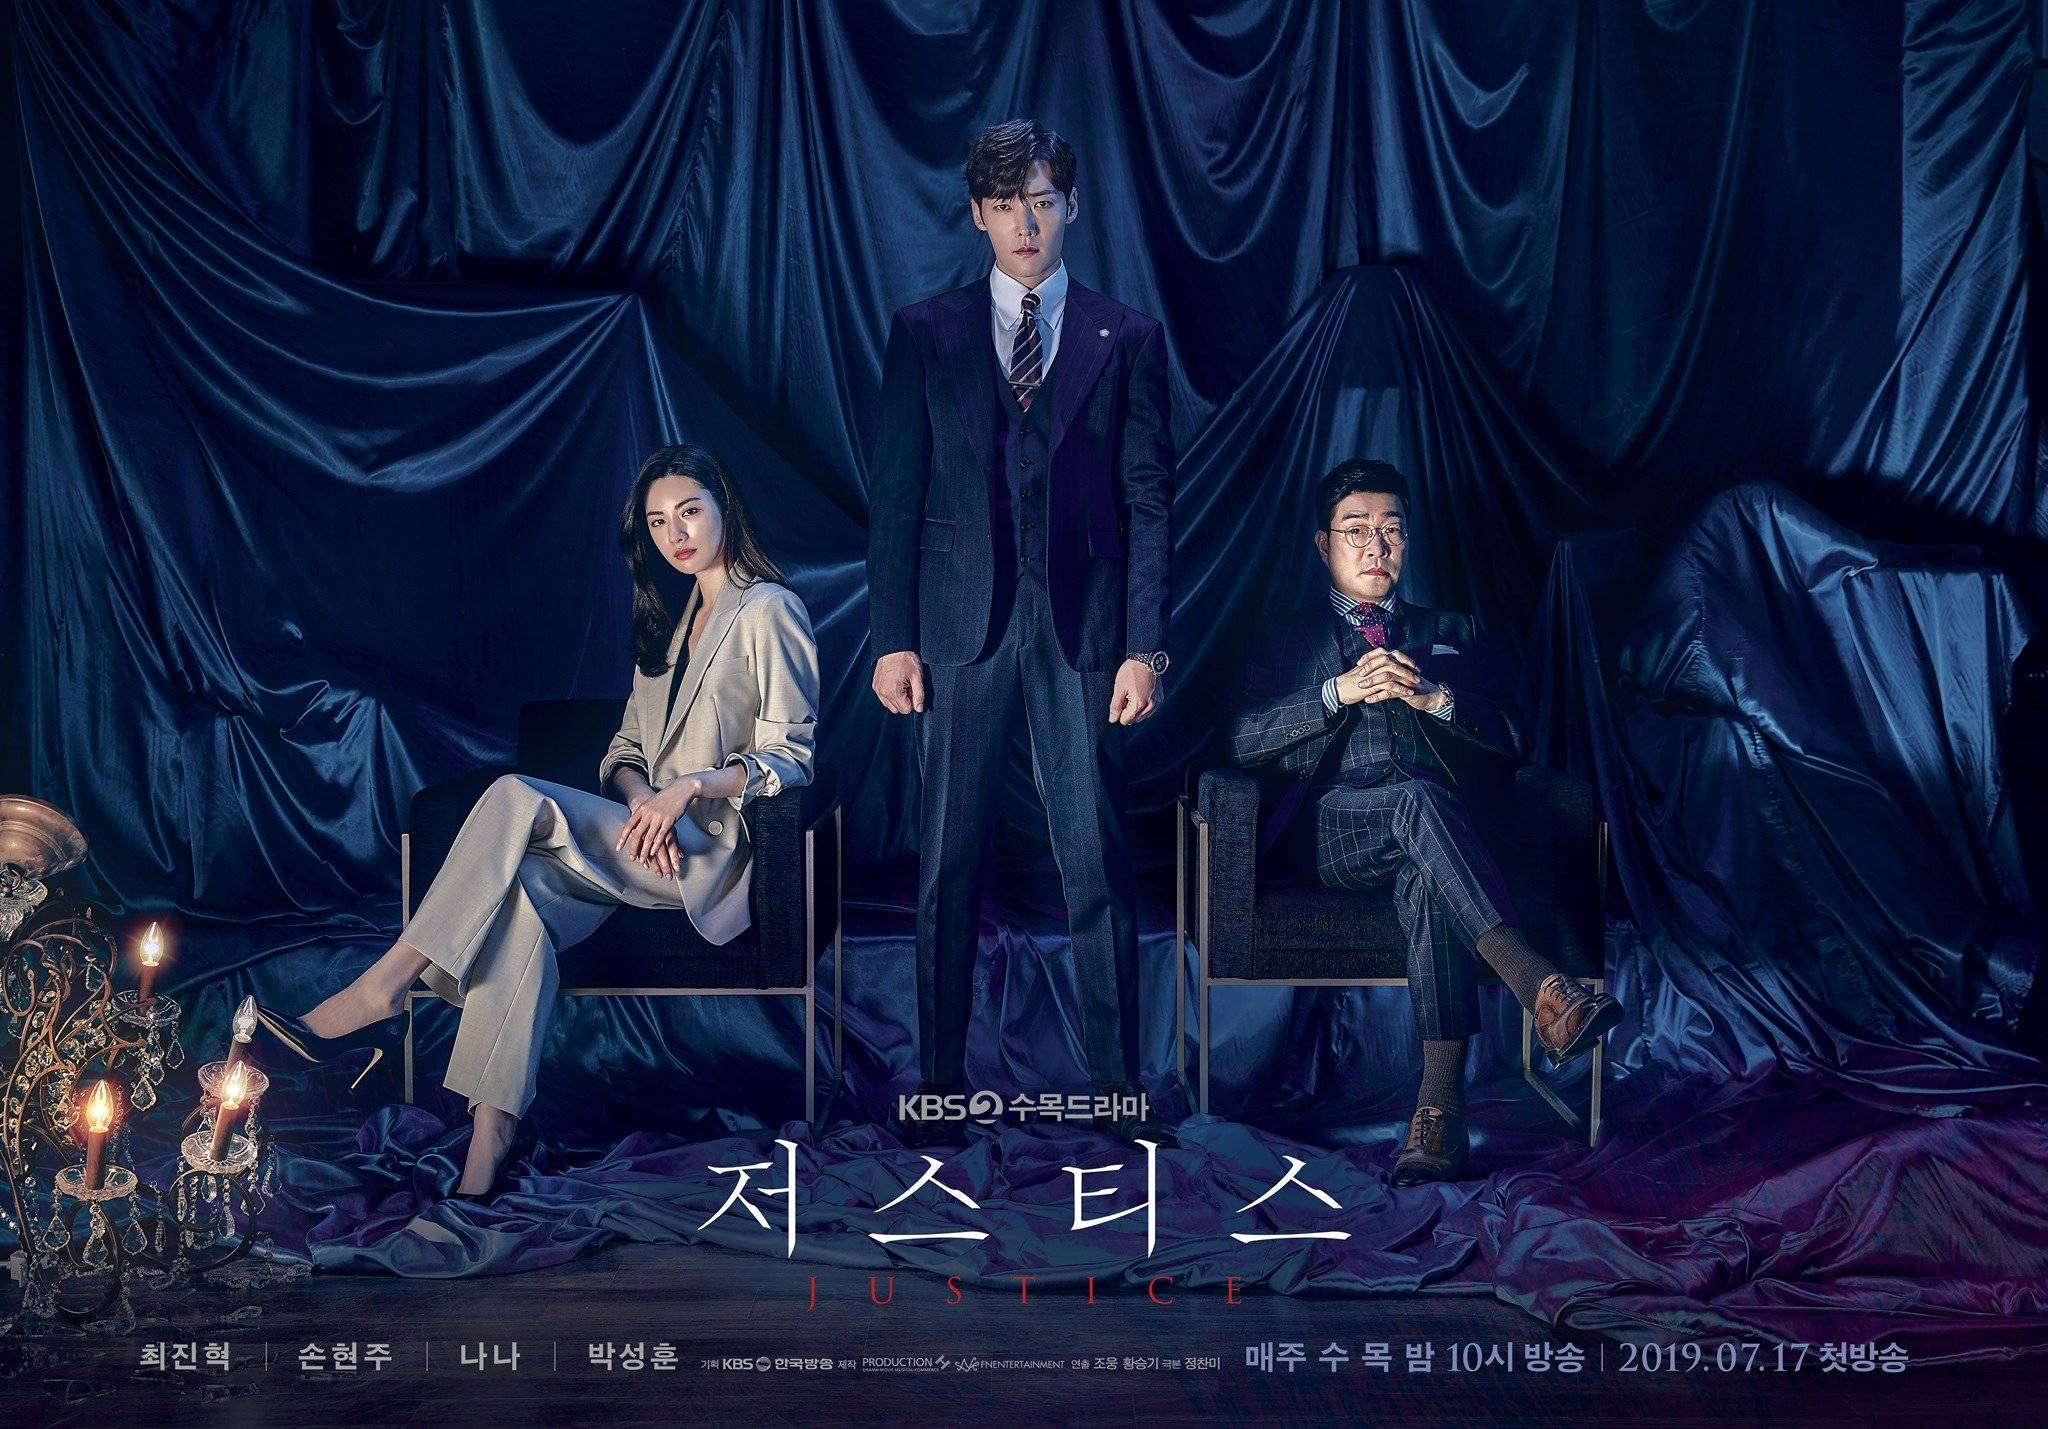 Justice Cast Korean Drama 2019 Ì€ìŠ¤í‹°ìŠ¤ Hancinema The Korean Movie And Drama Database Never gone full movie sub indo mp3 & mp4. justice cast korean drama 2019 저